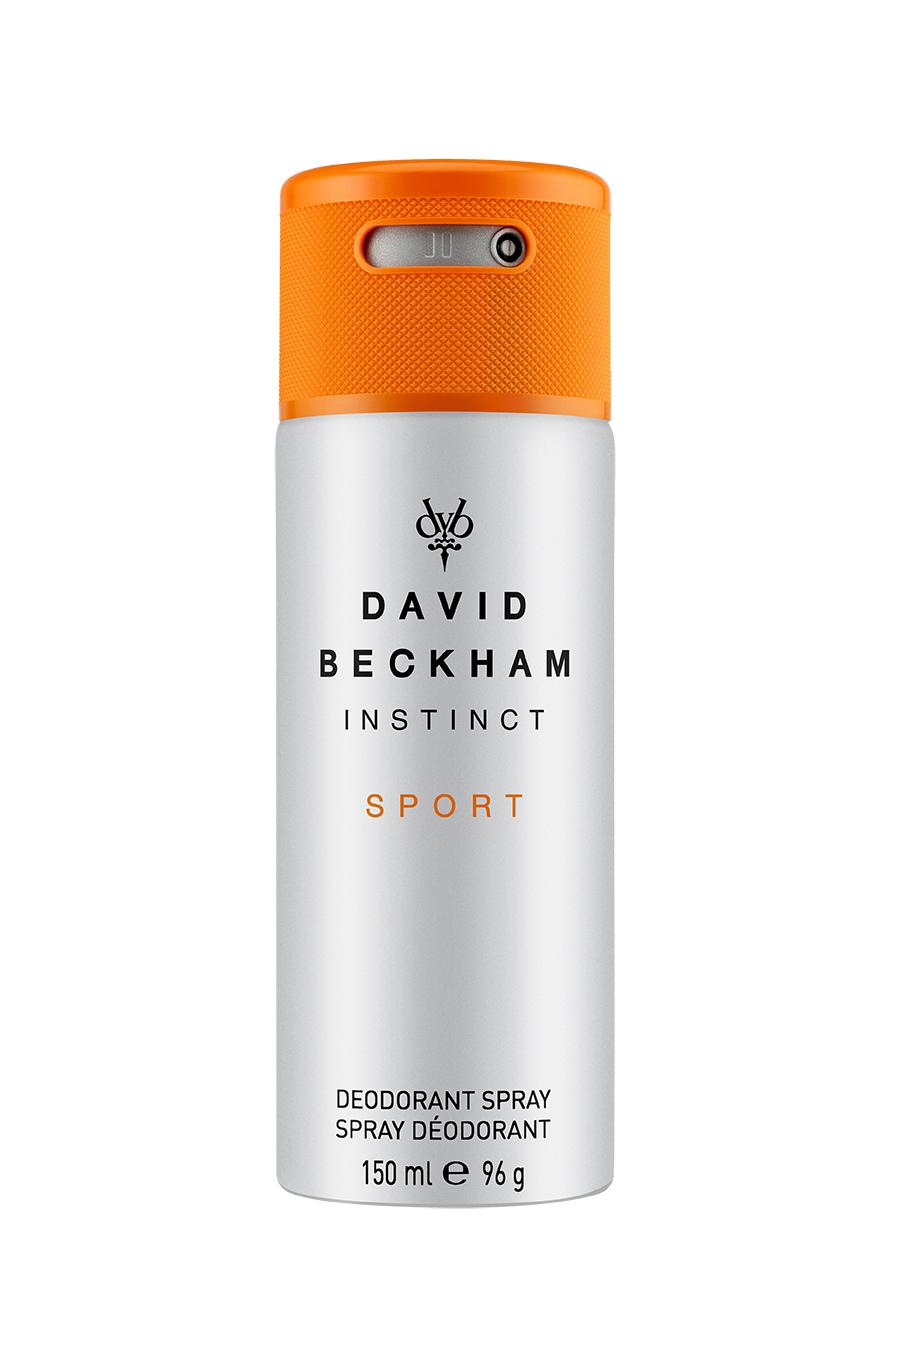 David Beckham | Instinct Sport Deodorant Spray 150 ML